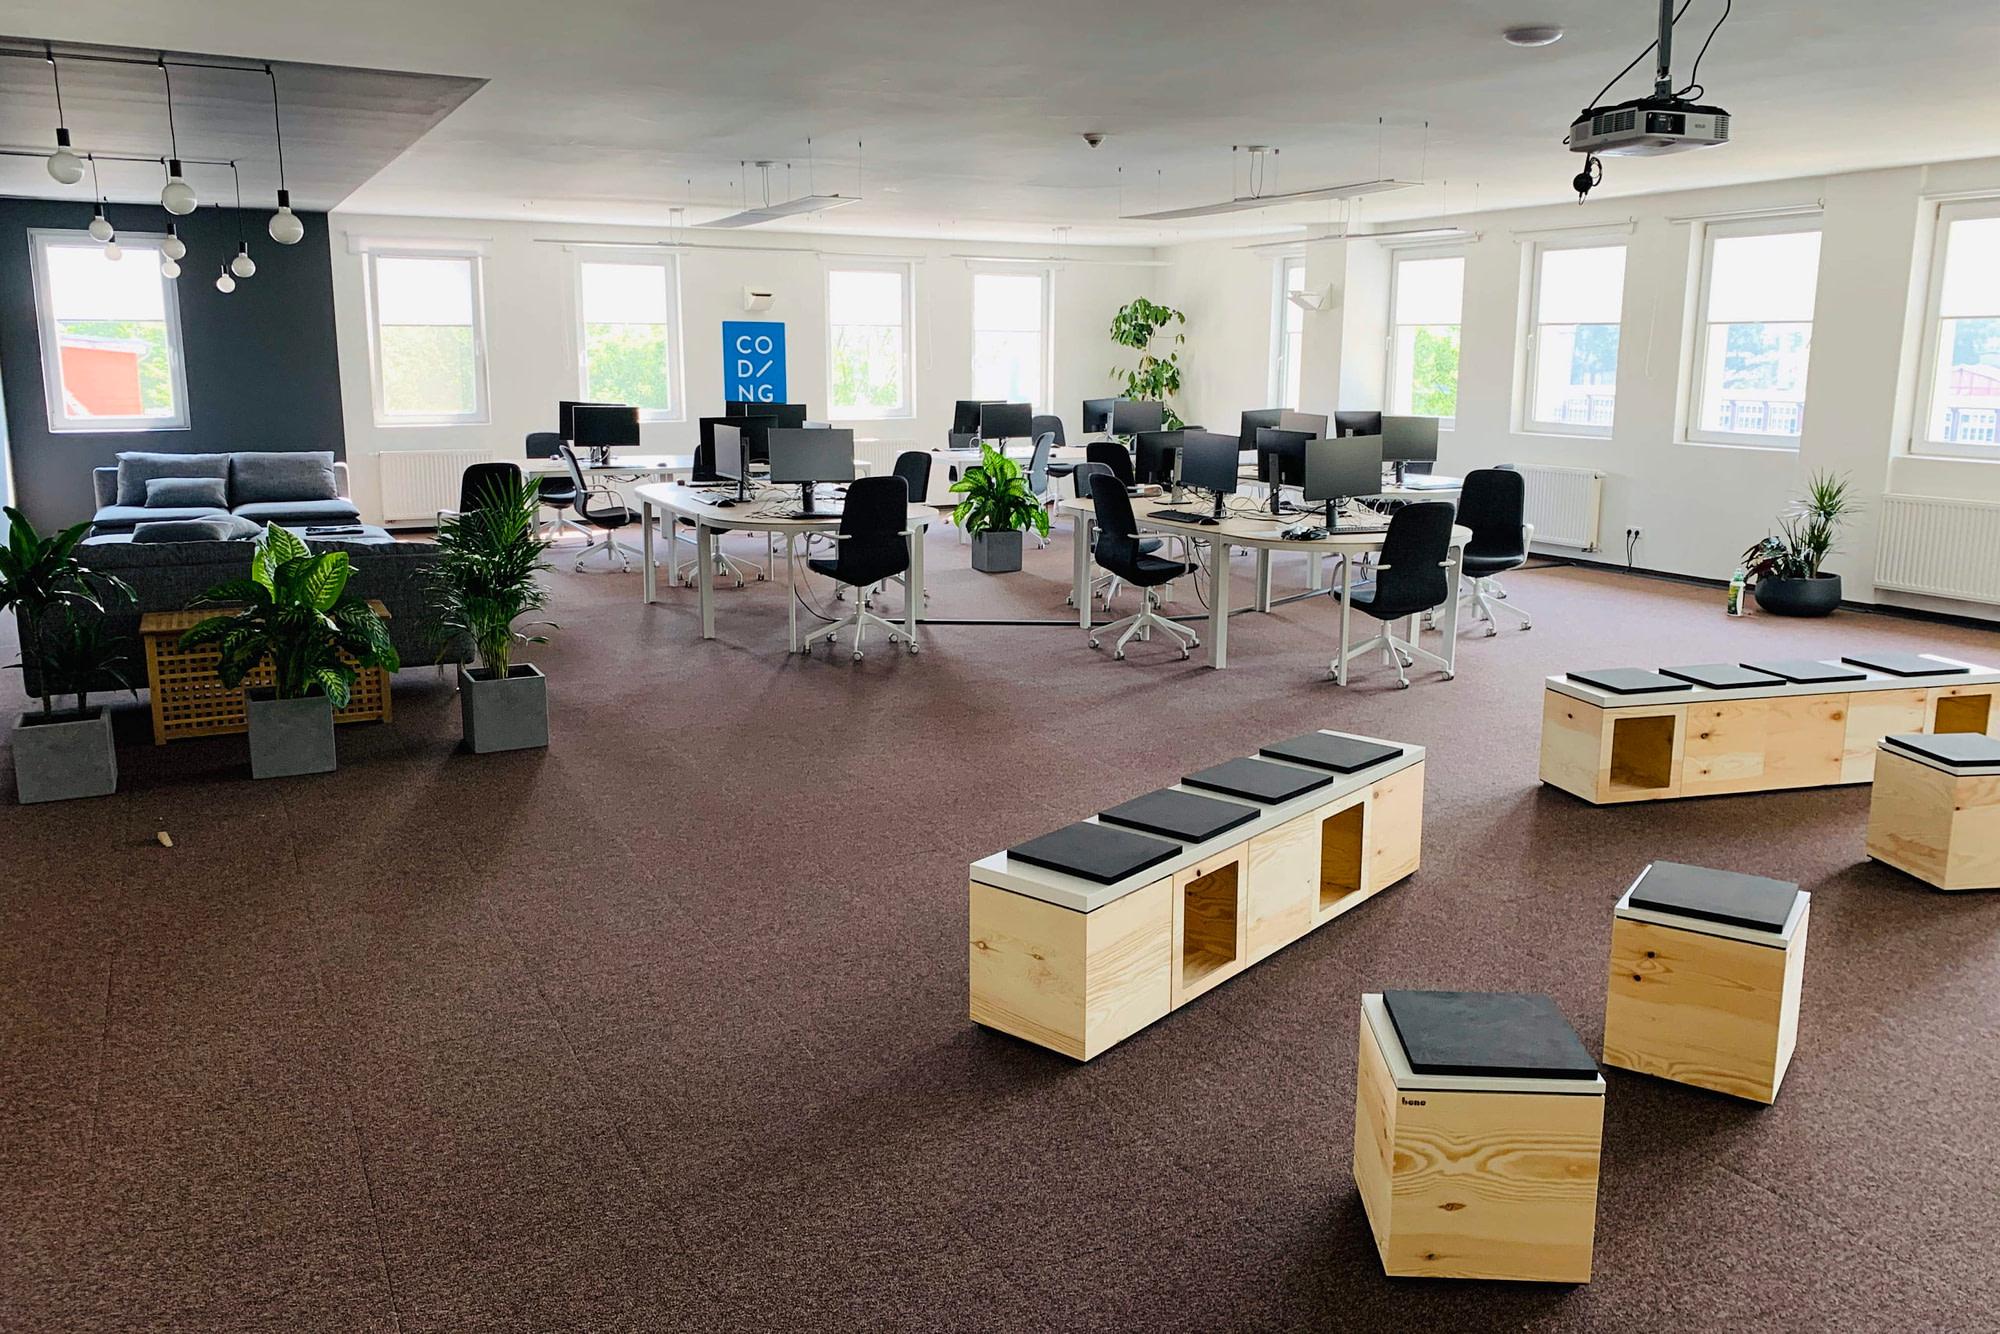 Classroom 'Atari' at Berlin campus of WBS CODING SCHOOL.